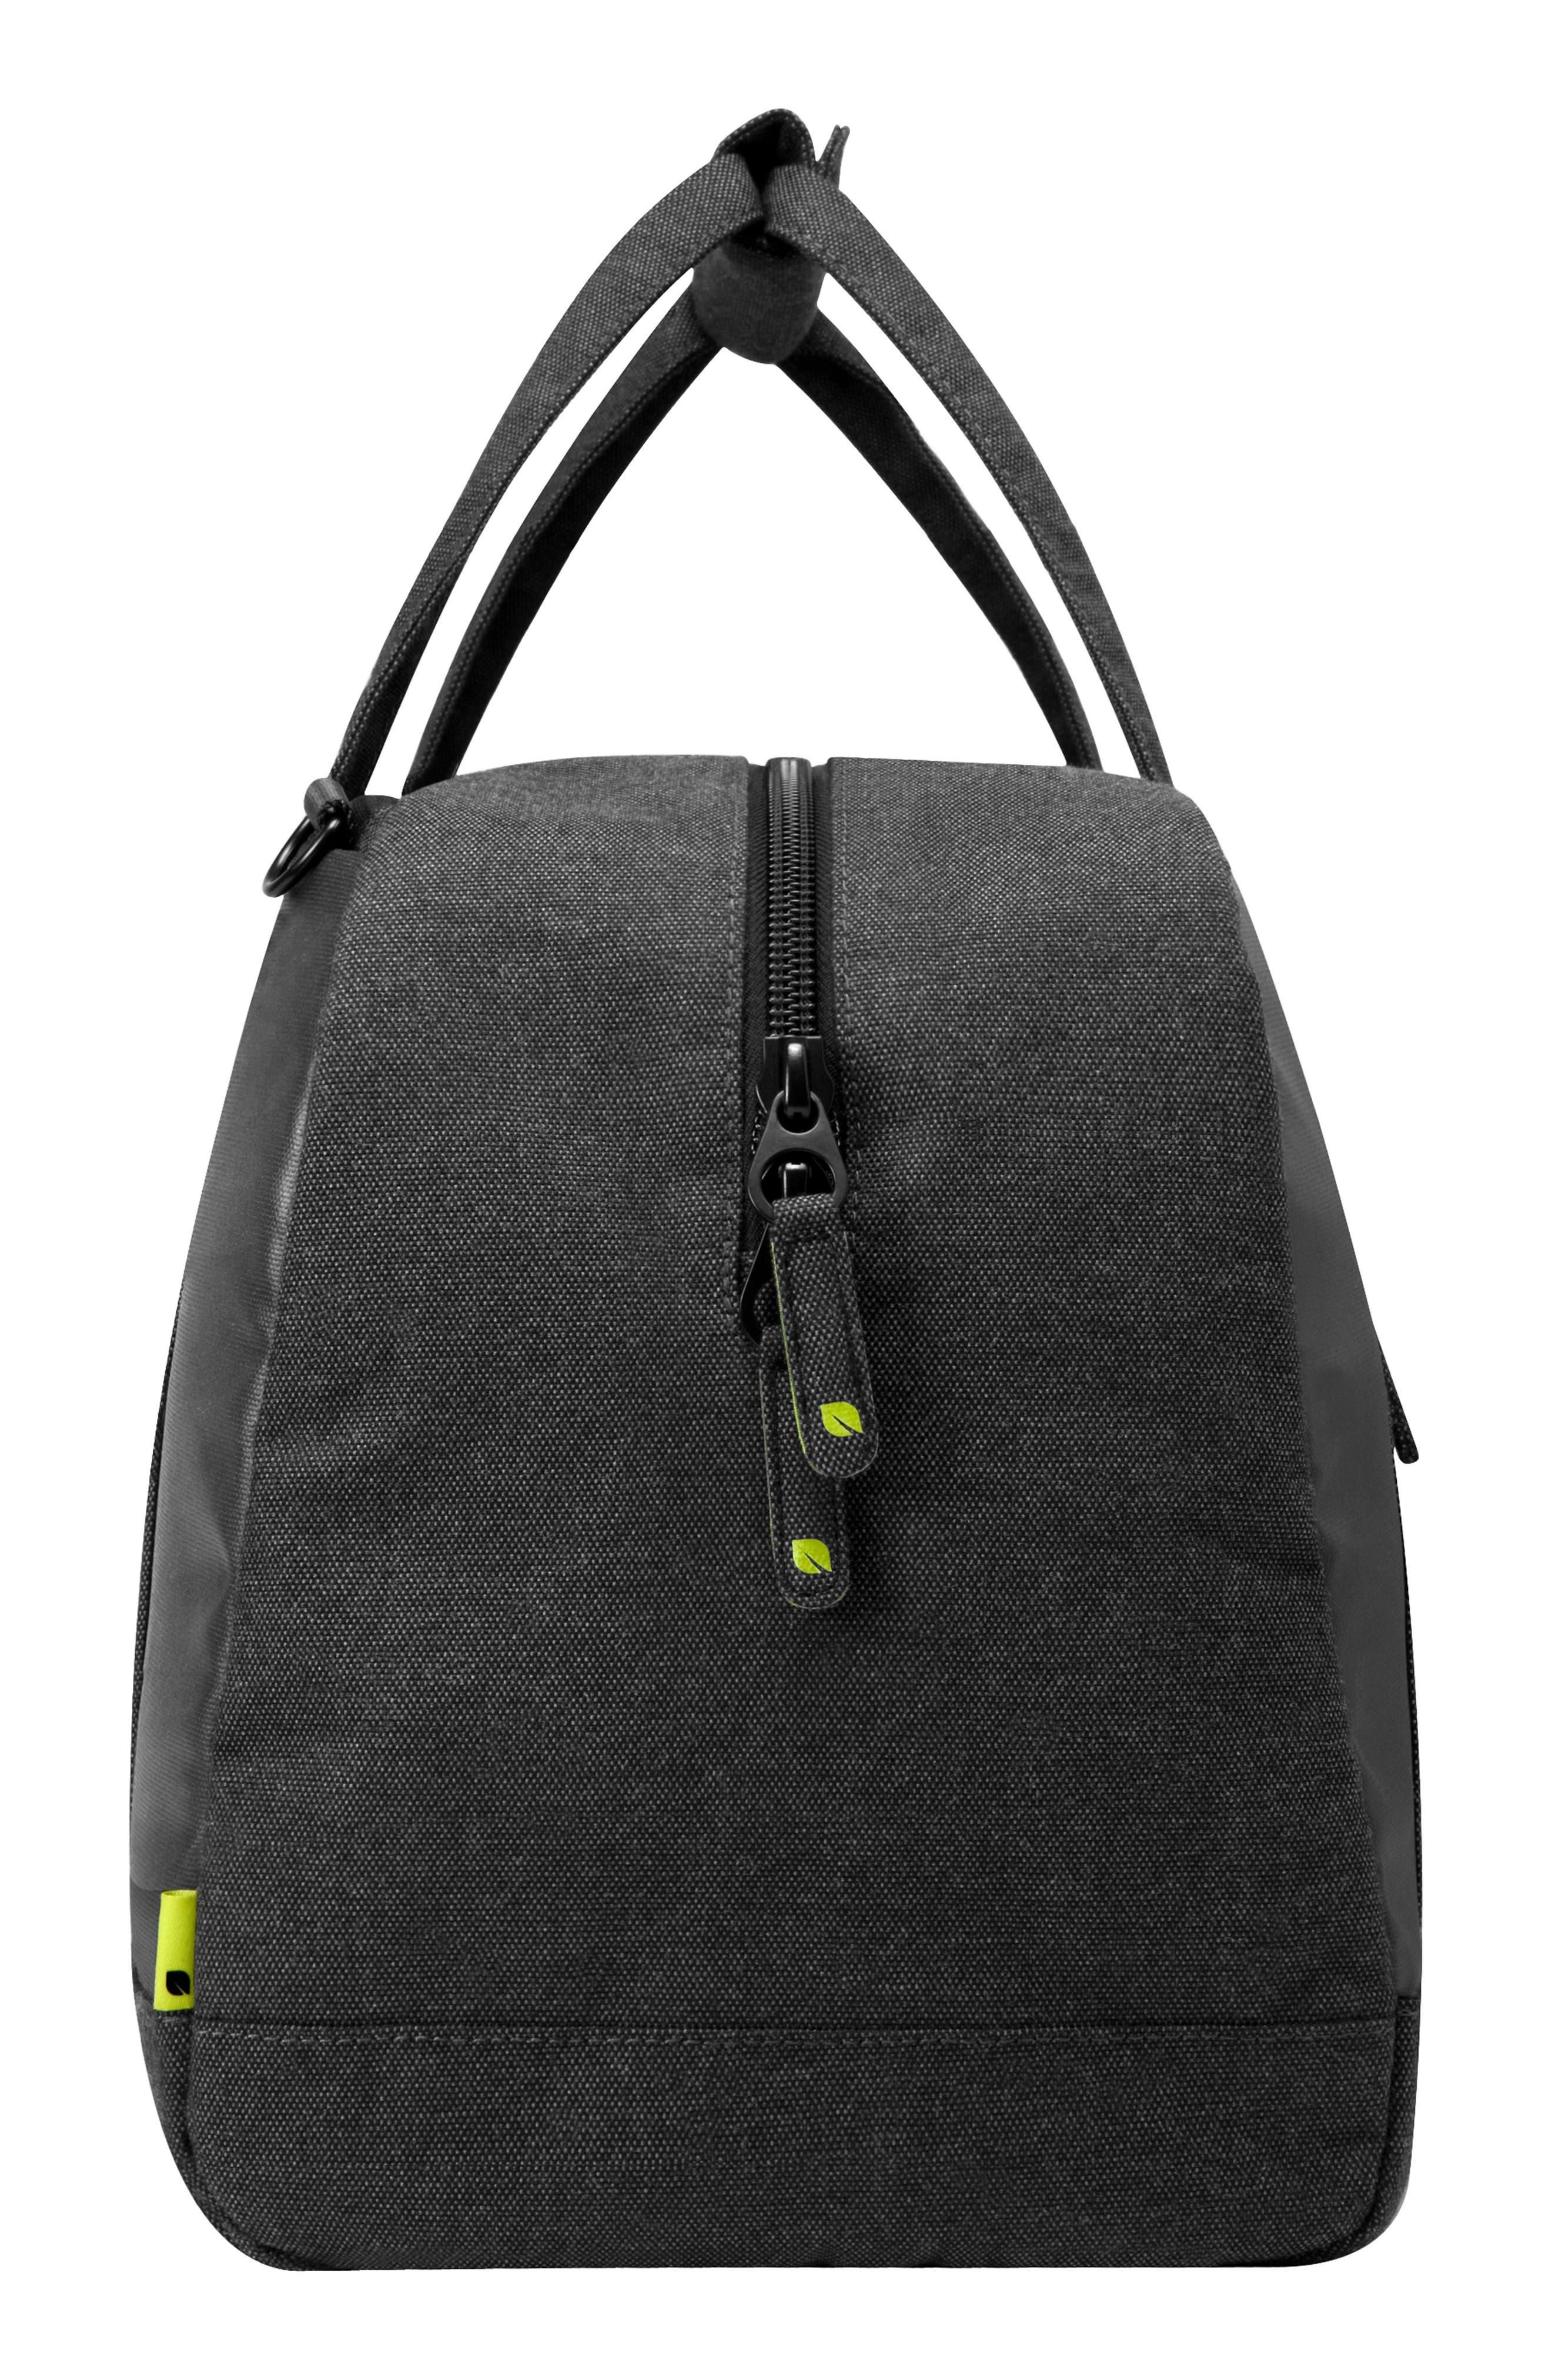 INCASE DESIGNS,                             EO Duffel Bag,                             Alternate thumbnail 5, color,                             BLACK